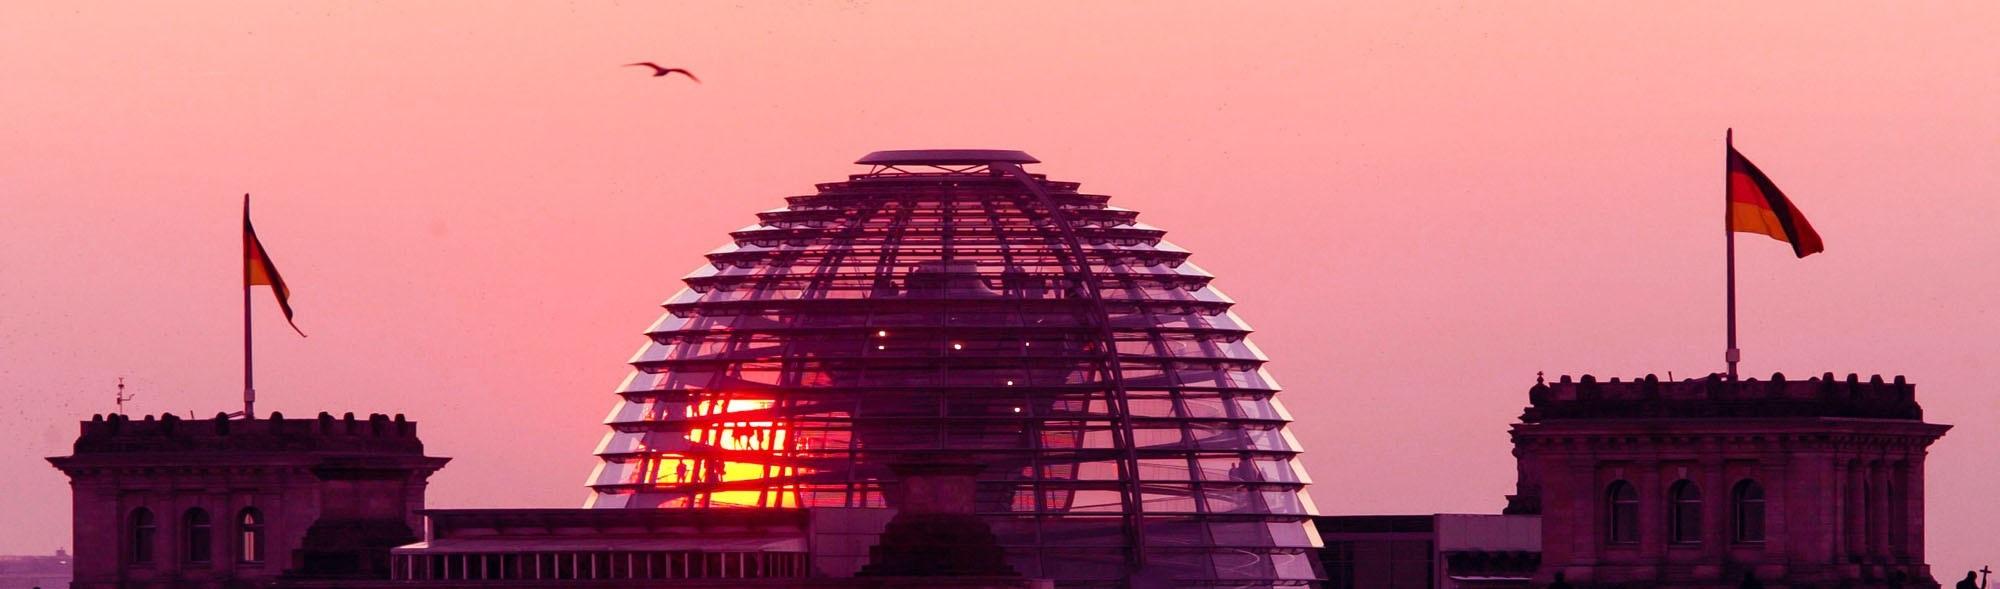 Sonnenuntergang ueber Reichtagskuppel